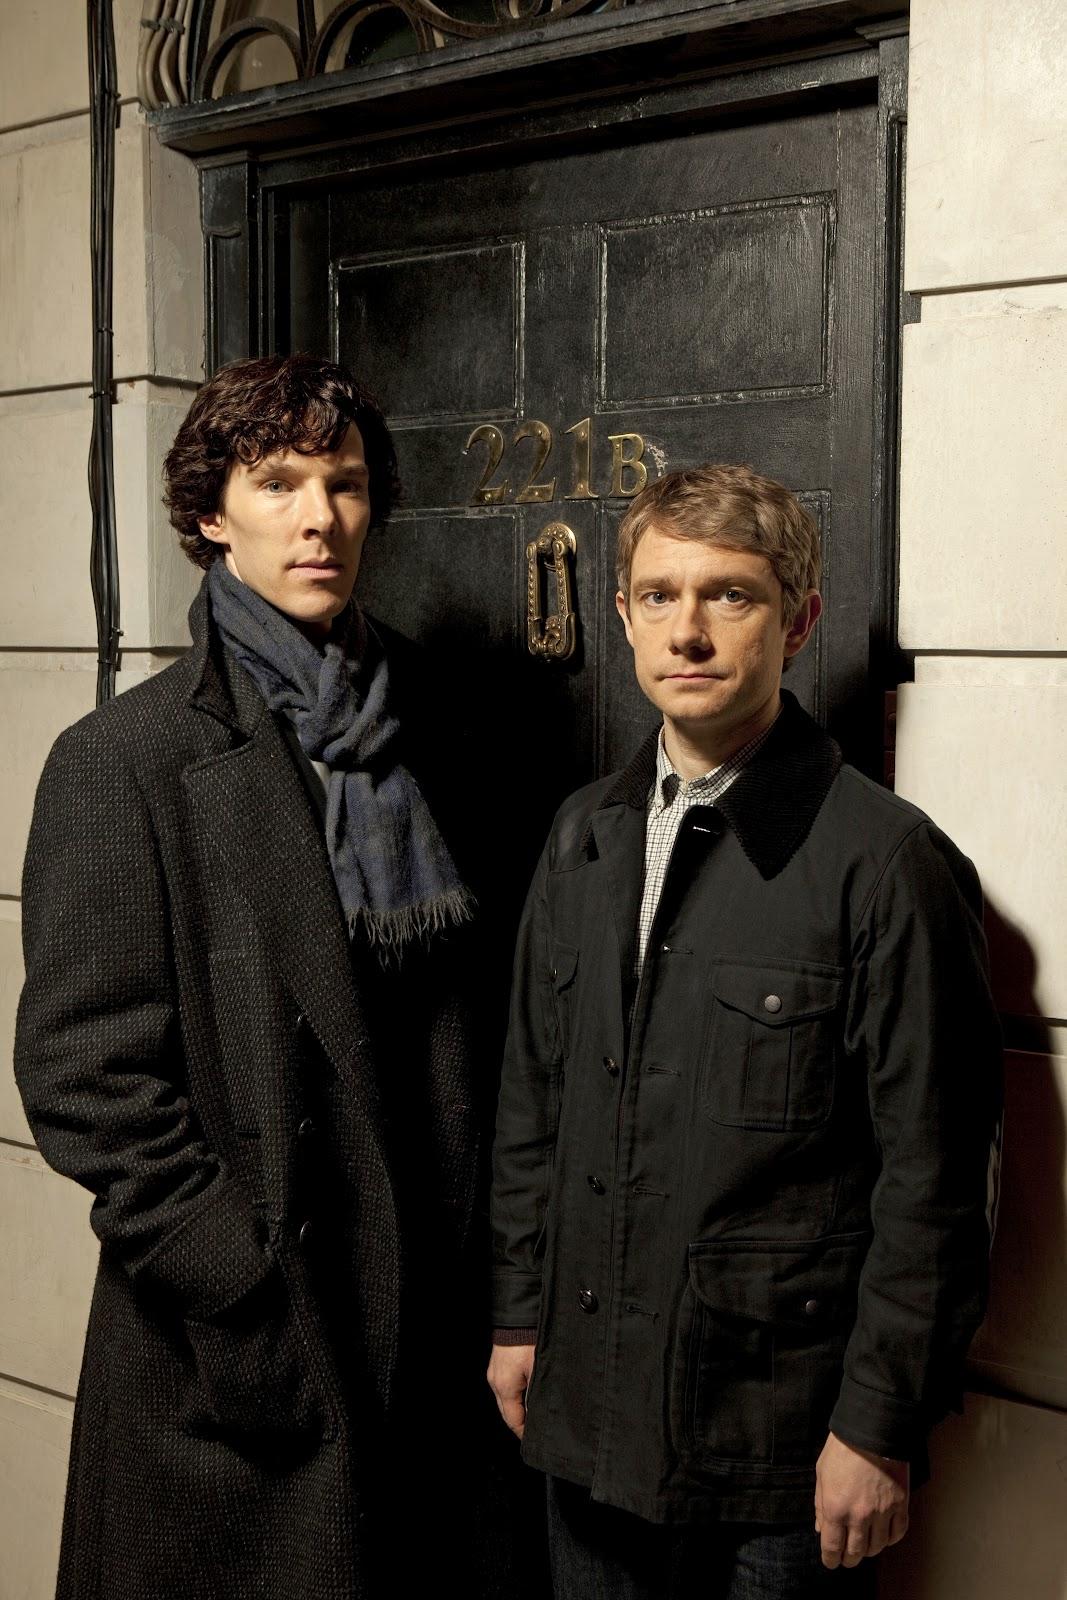 http://3.bp.blogspot.com/-xfuOHMLHYcw/T0jcfFCMjtI/AAAAAAAAB2o/0DDABZQgjYc/s1600/Sherlock_BCMF.jpg